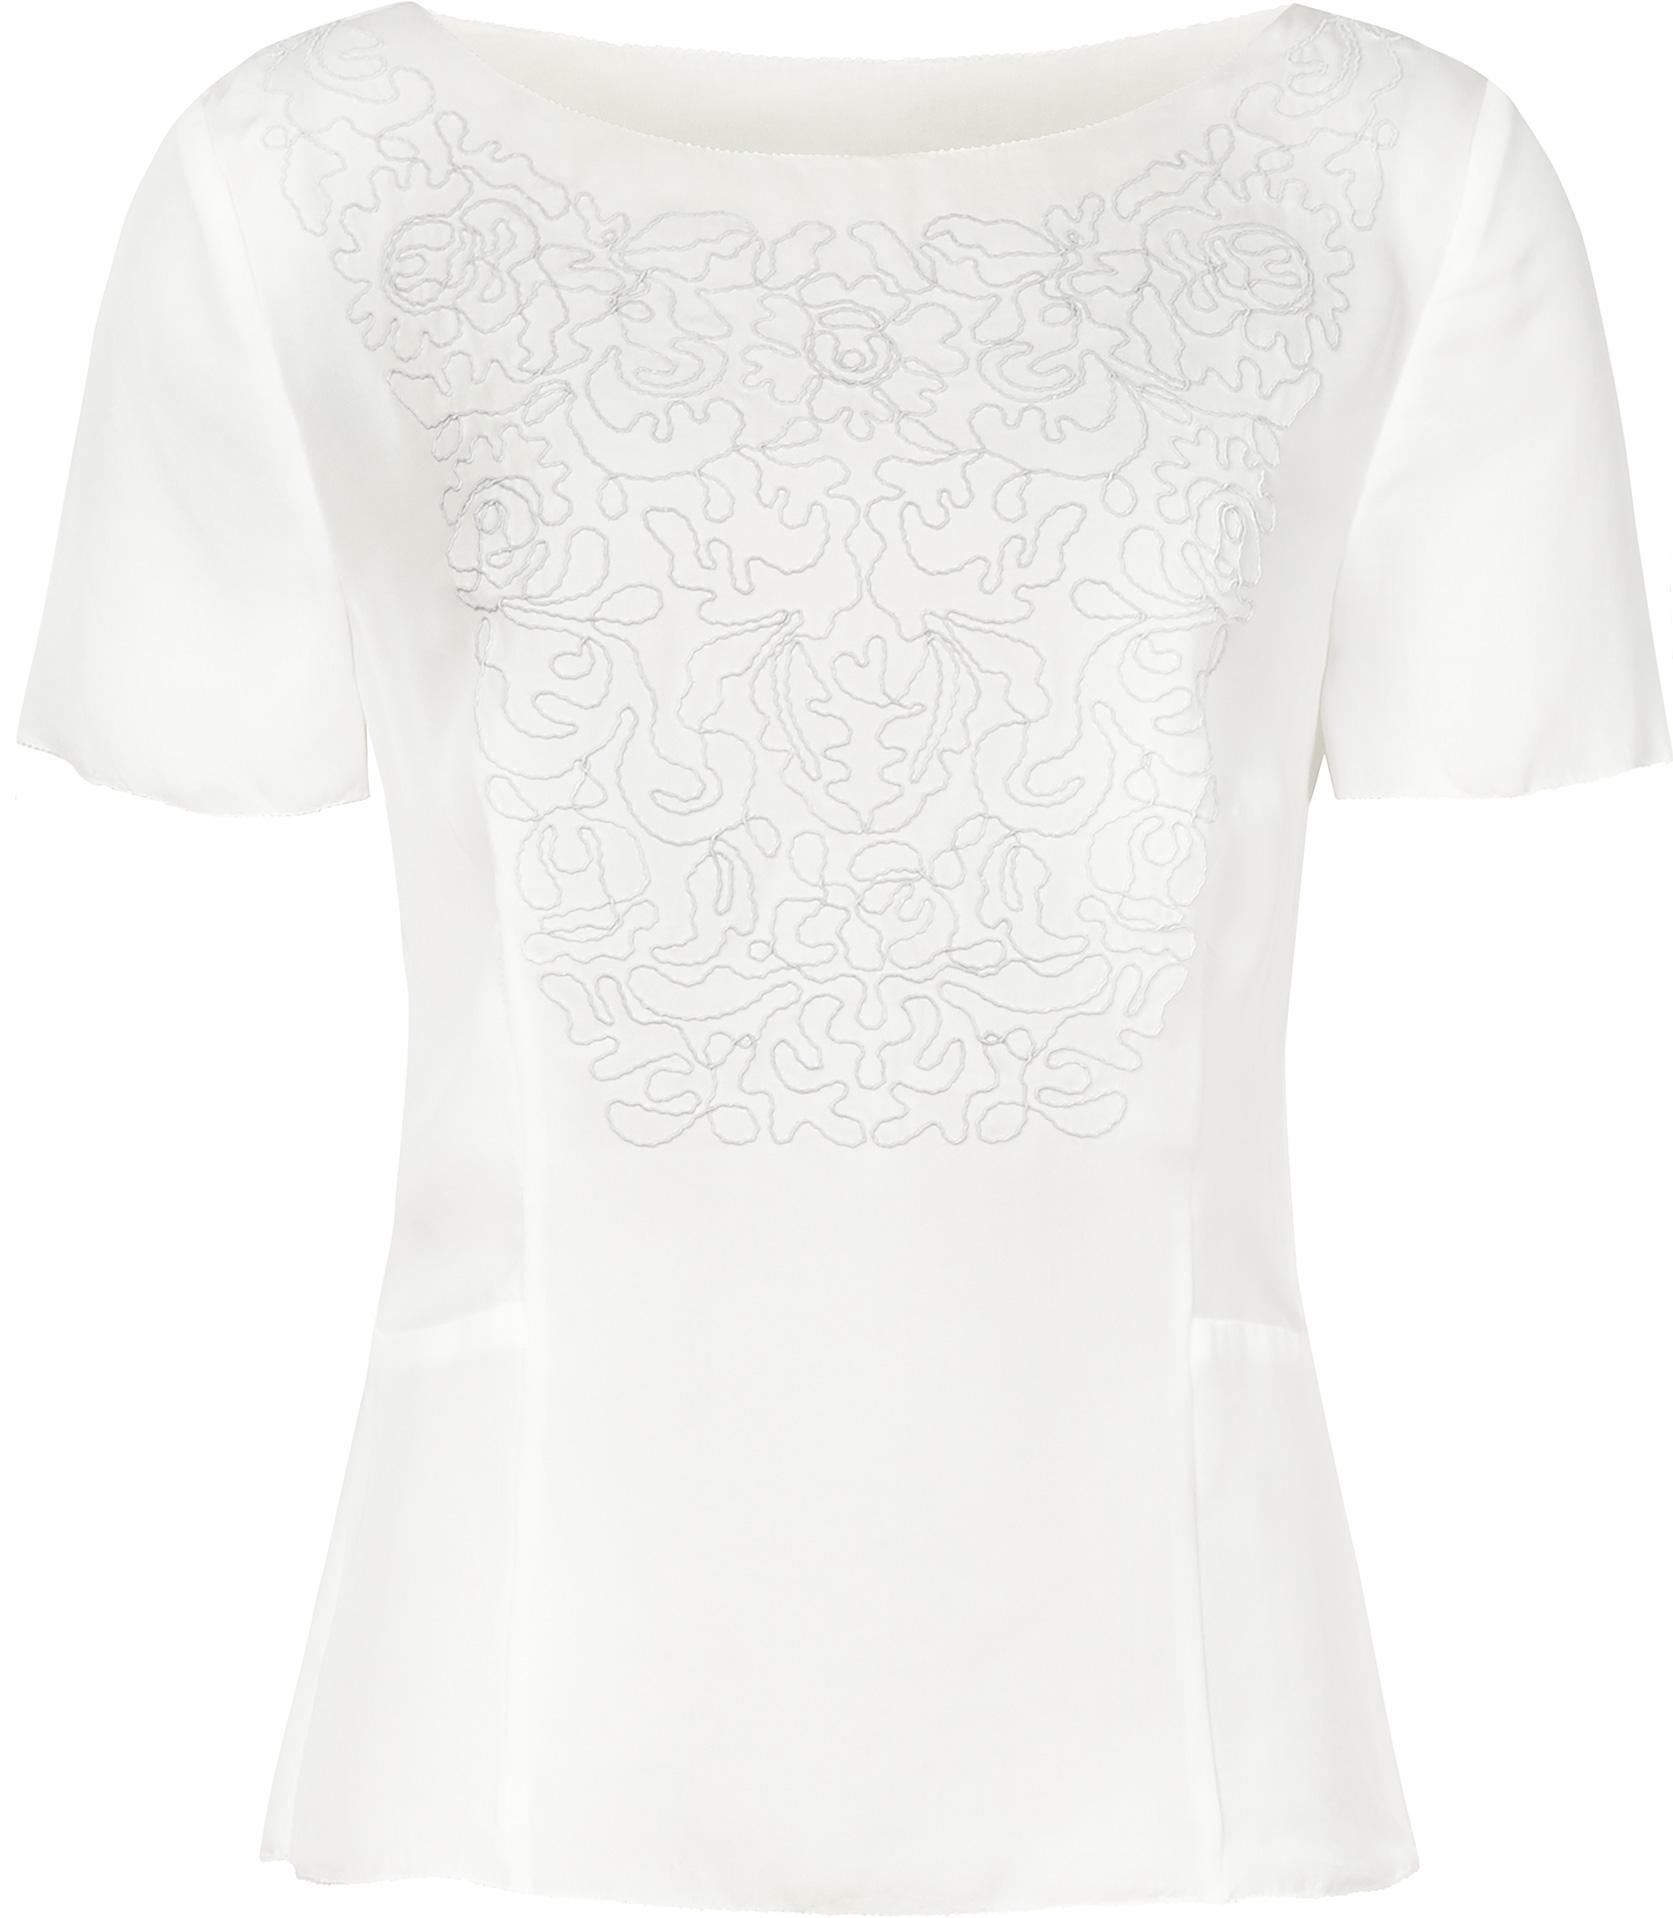 2308821a048830 Reiss Fleur Floral Detail Top in White - Lyst